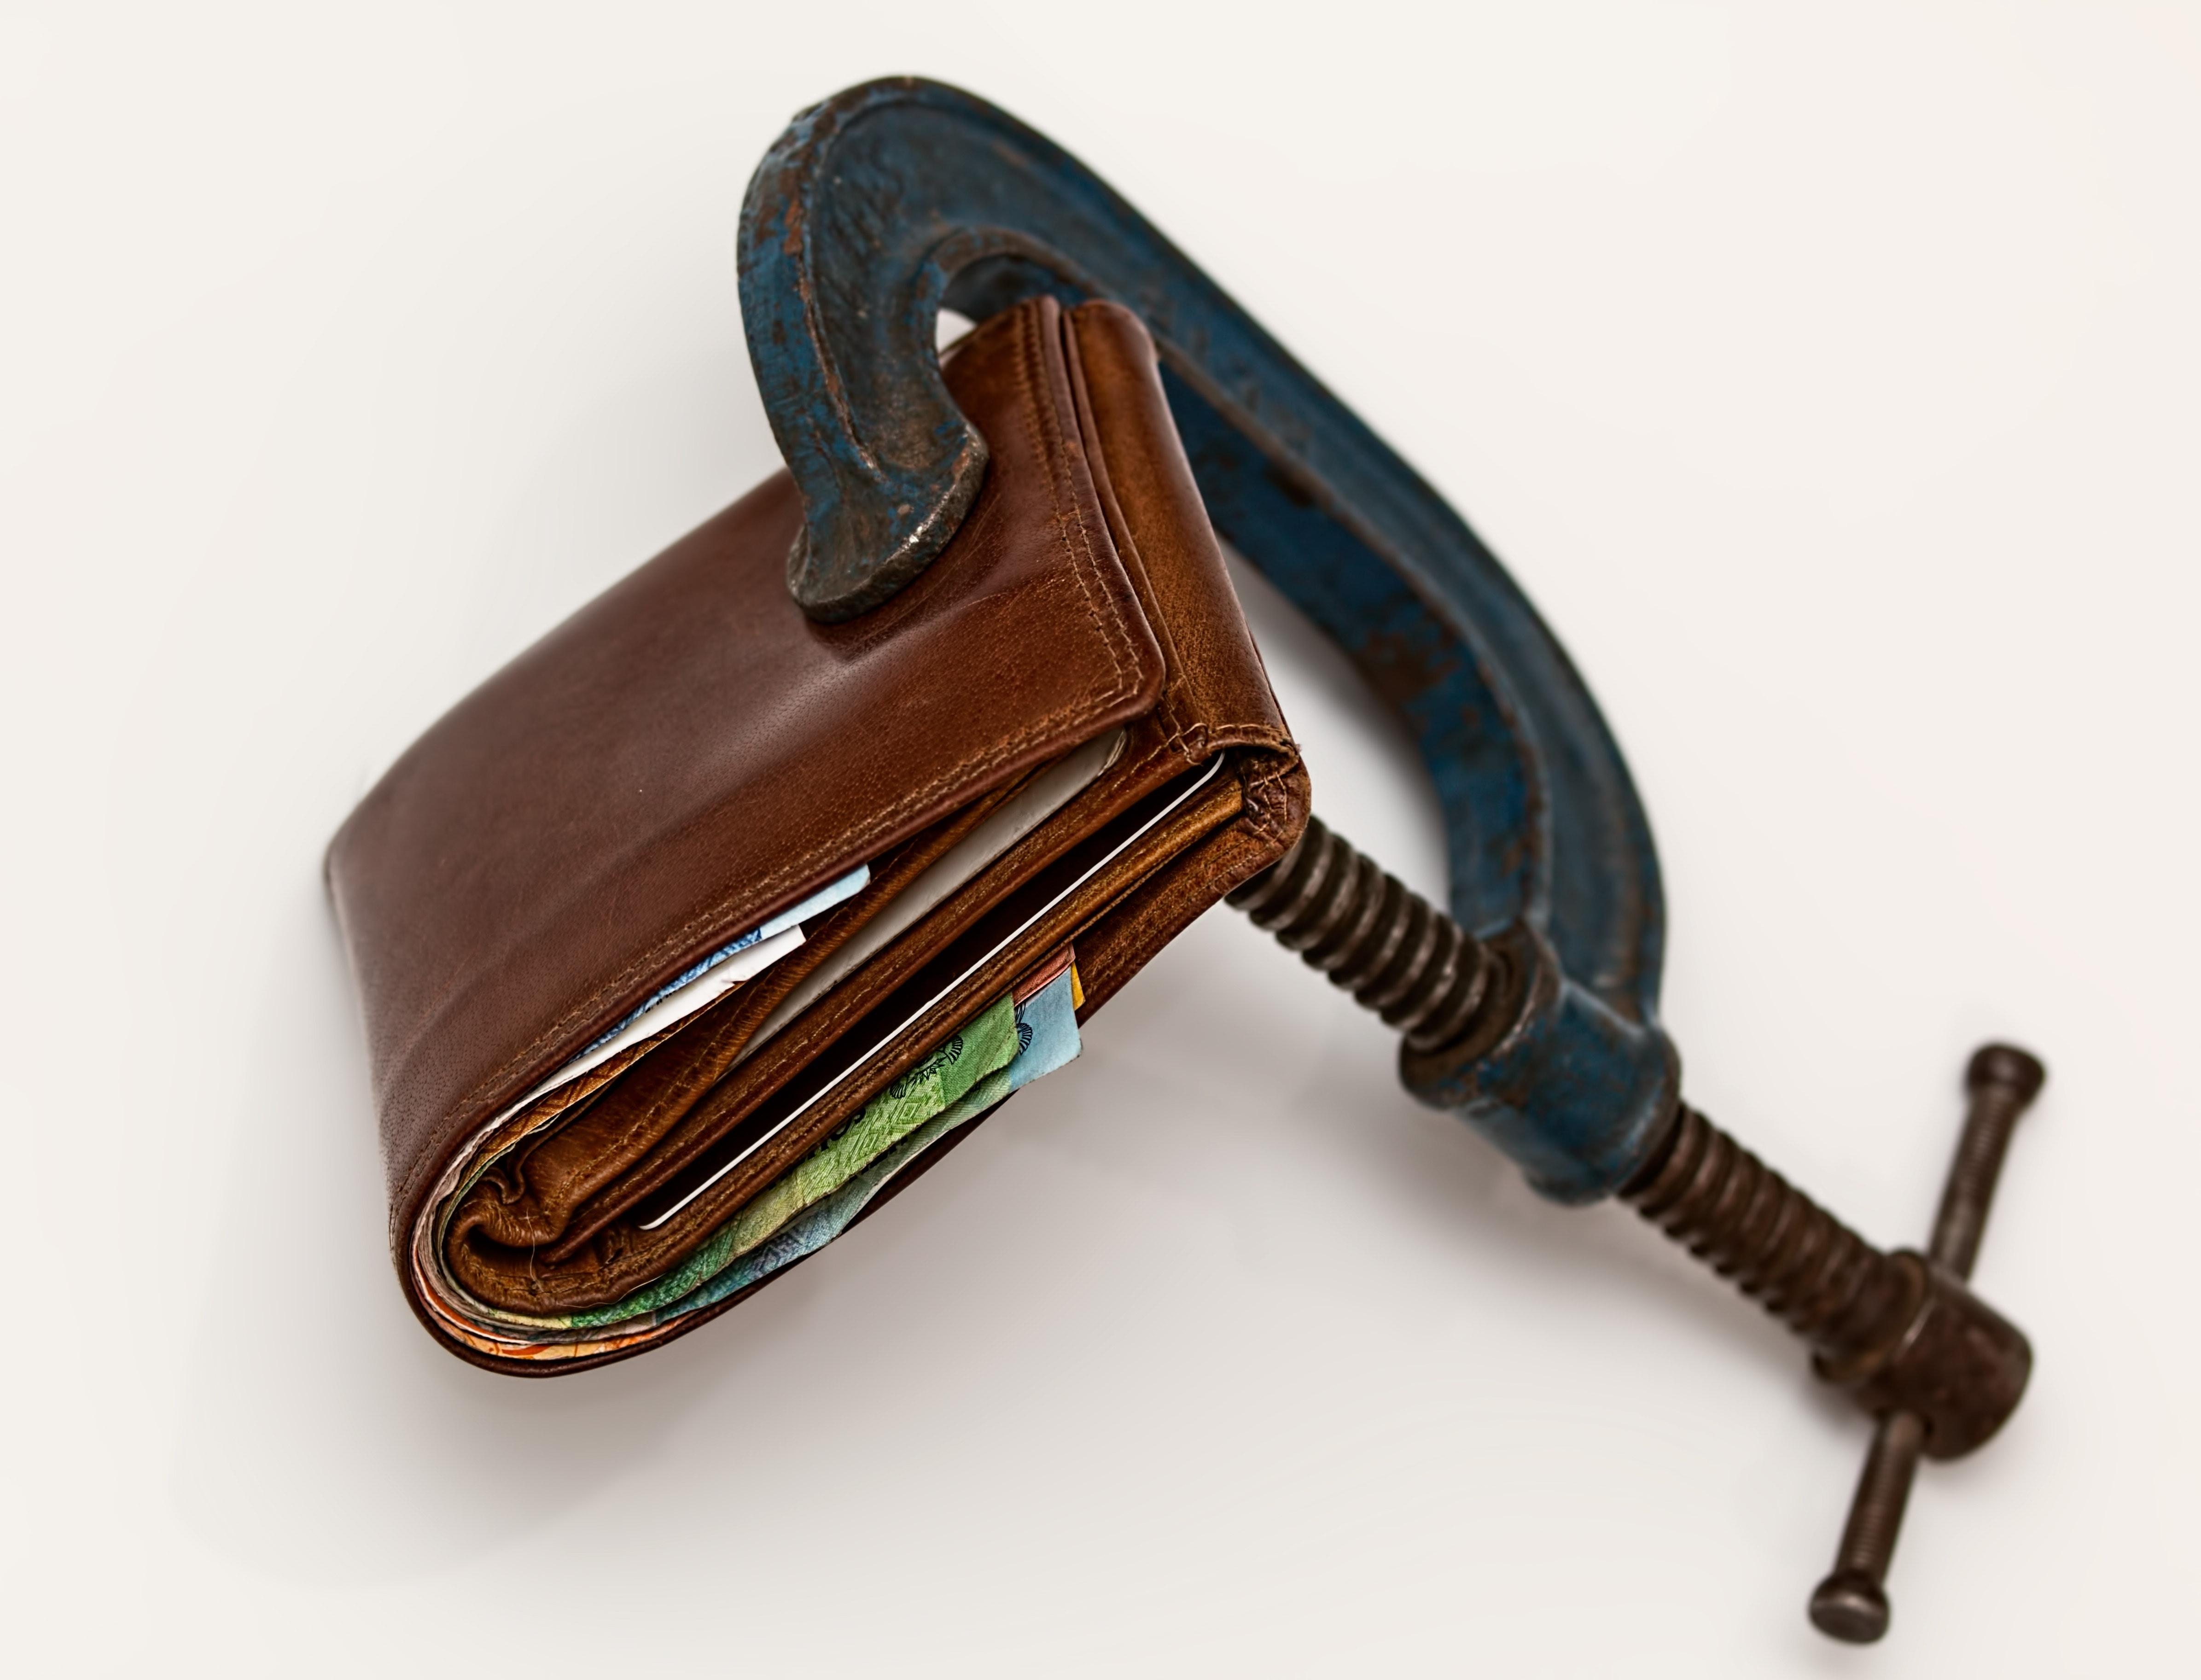 Wallet c-clamped shut